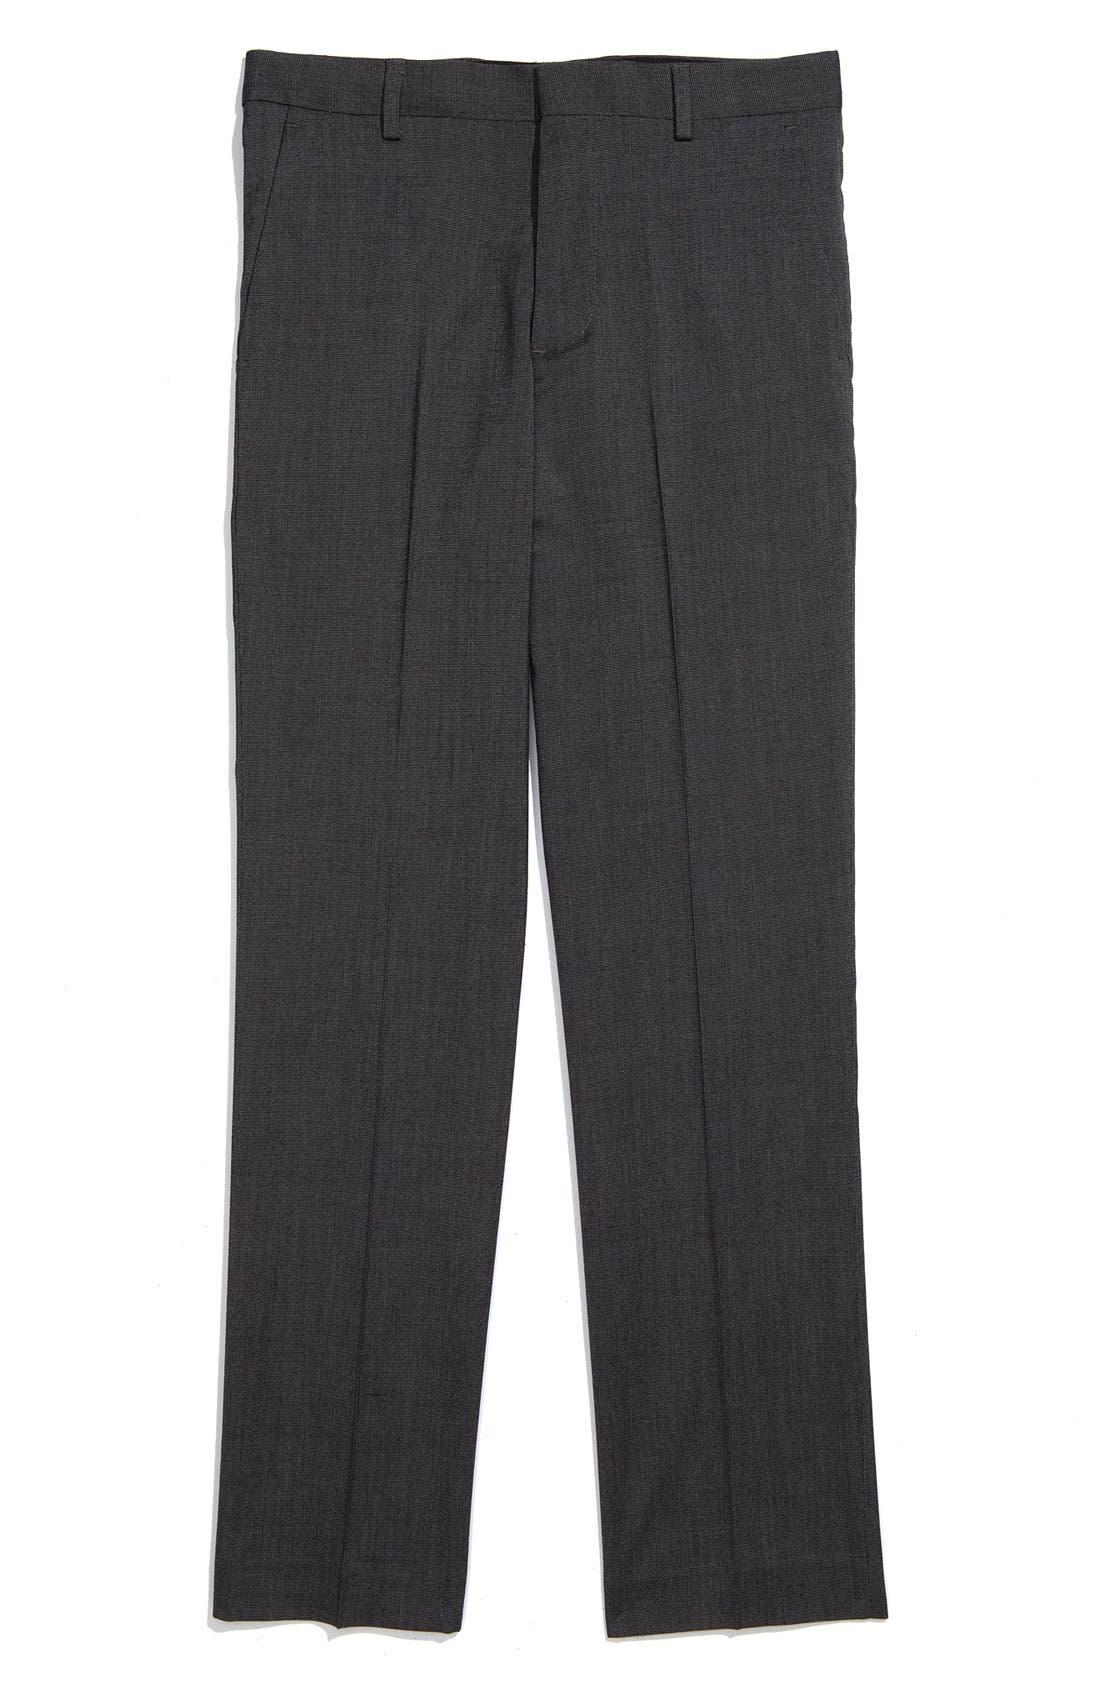 Main Image - C2 by Calibrate Flat Front Slim Fit Pants (Big Boys)